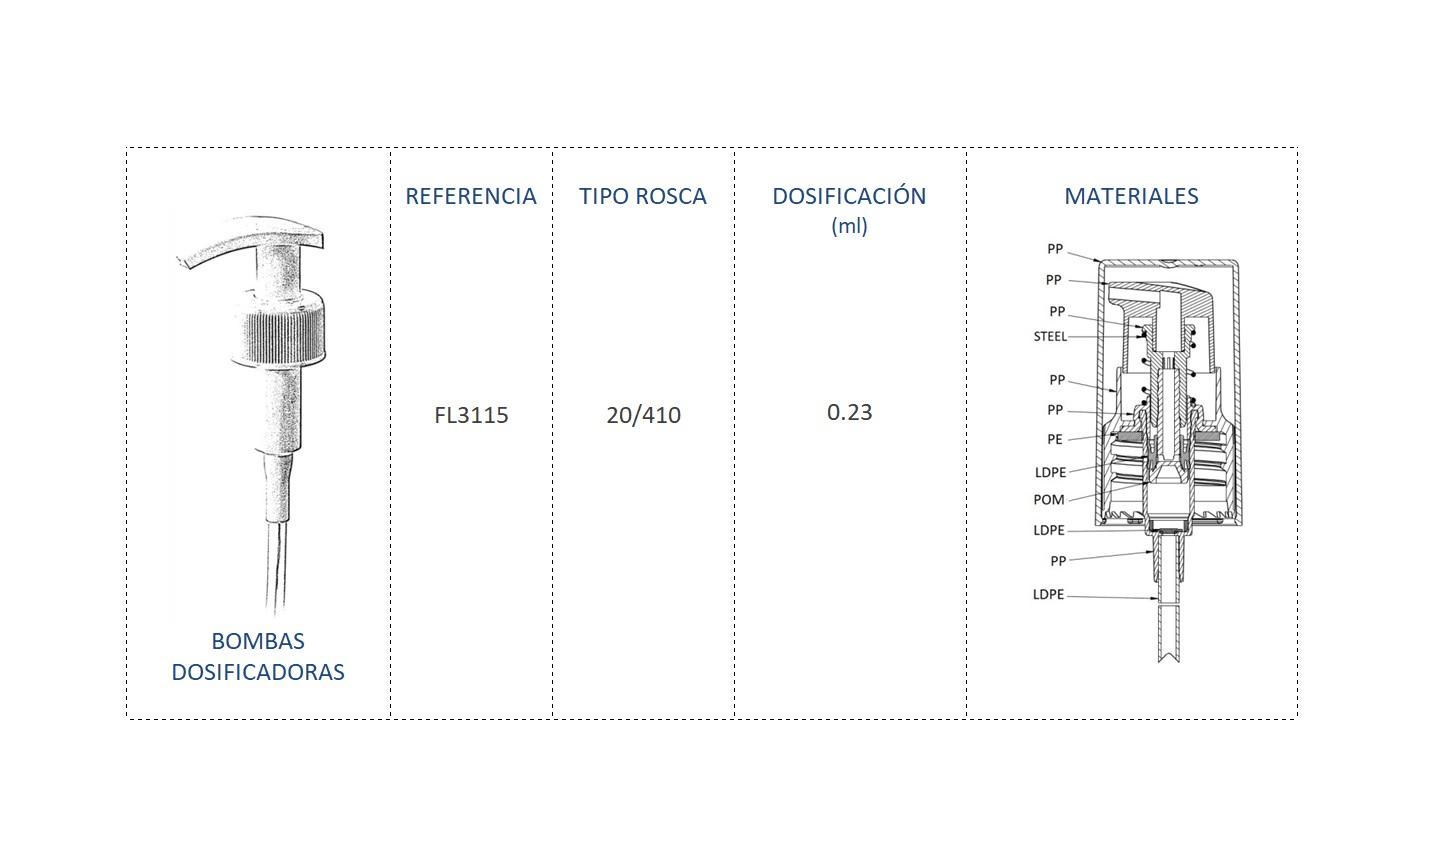 Cuadro de materiales bomba dosificadora FL3115 20-410